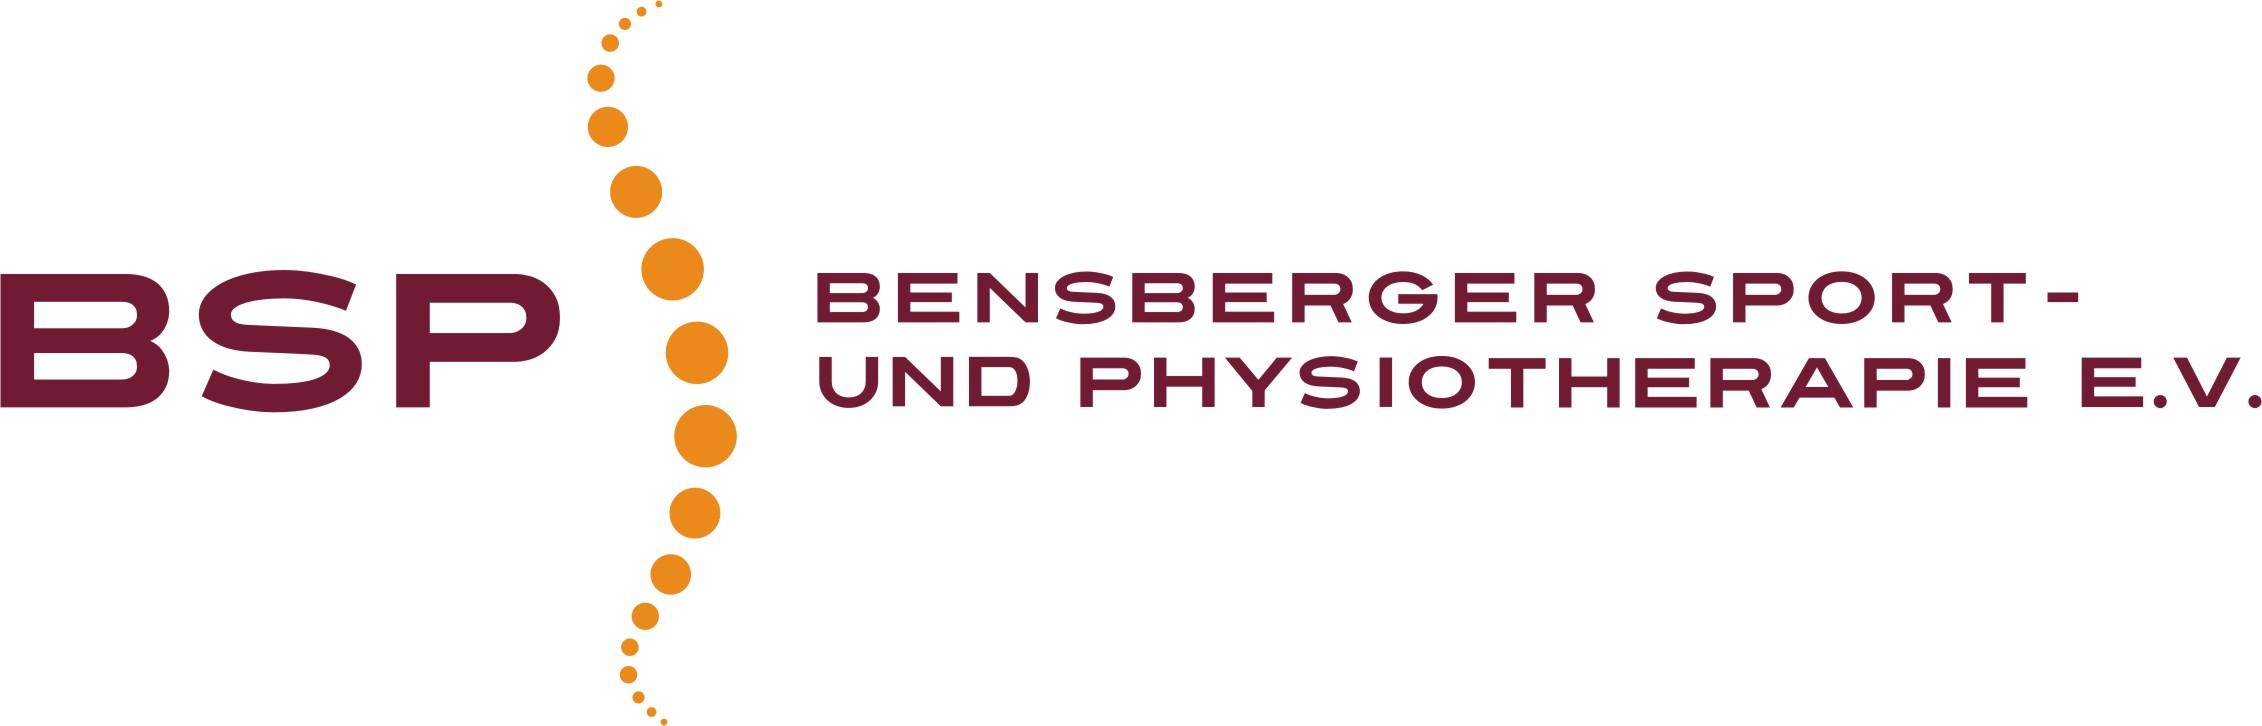 BSP – Bensberger Sport- und Physiotherapie e. V.